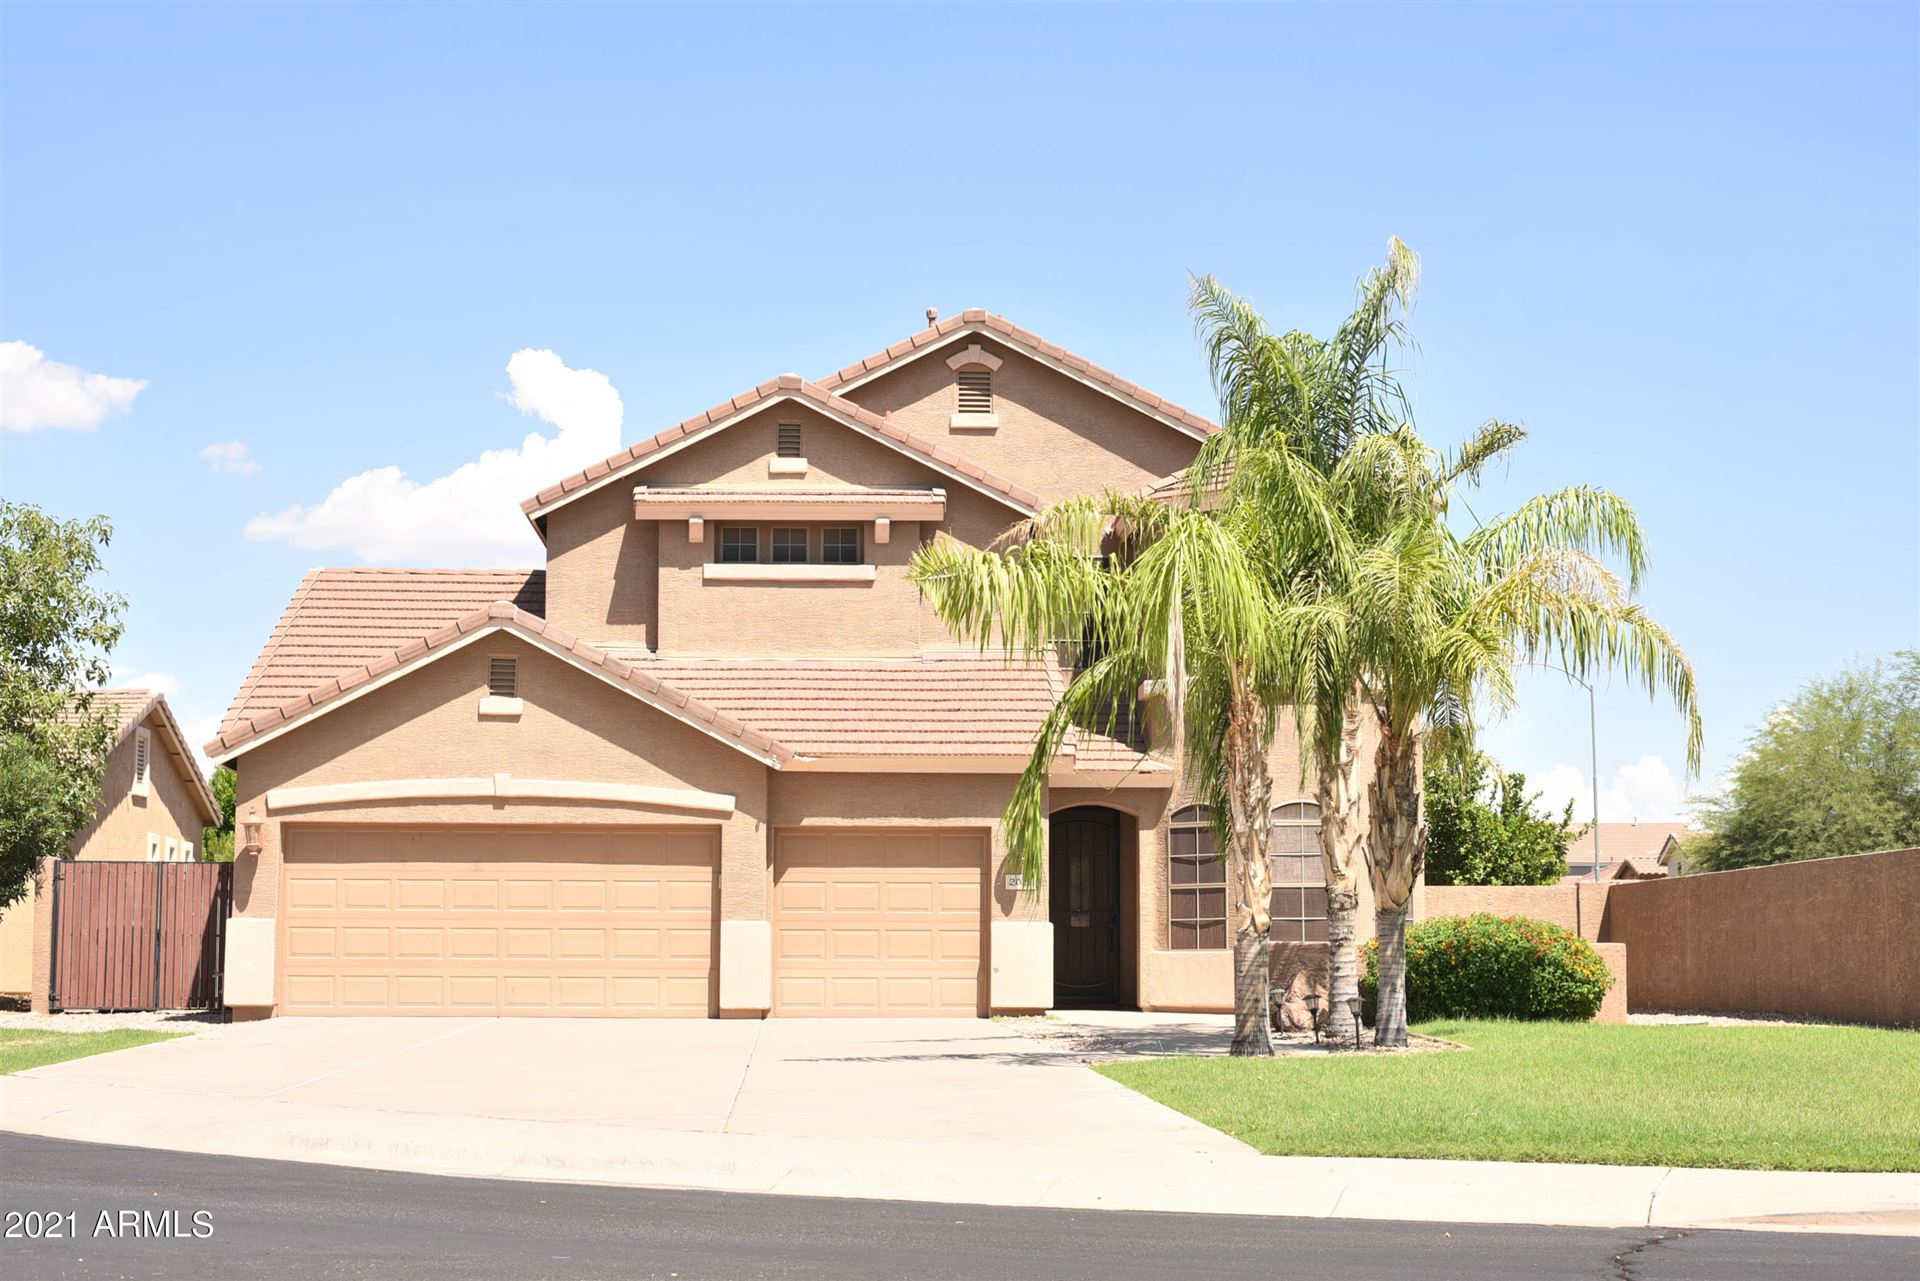 2021 S ESMERALDA Circle, Mesa, AZ 85209 - MLS#: 6274442